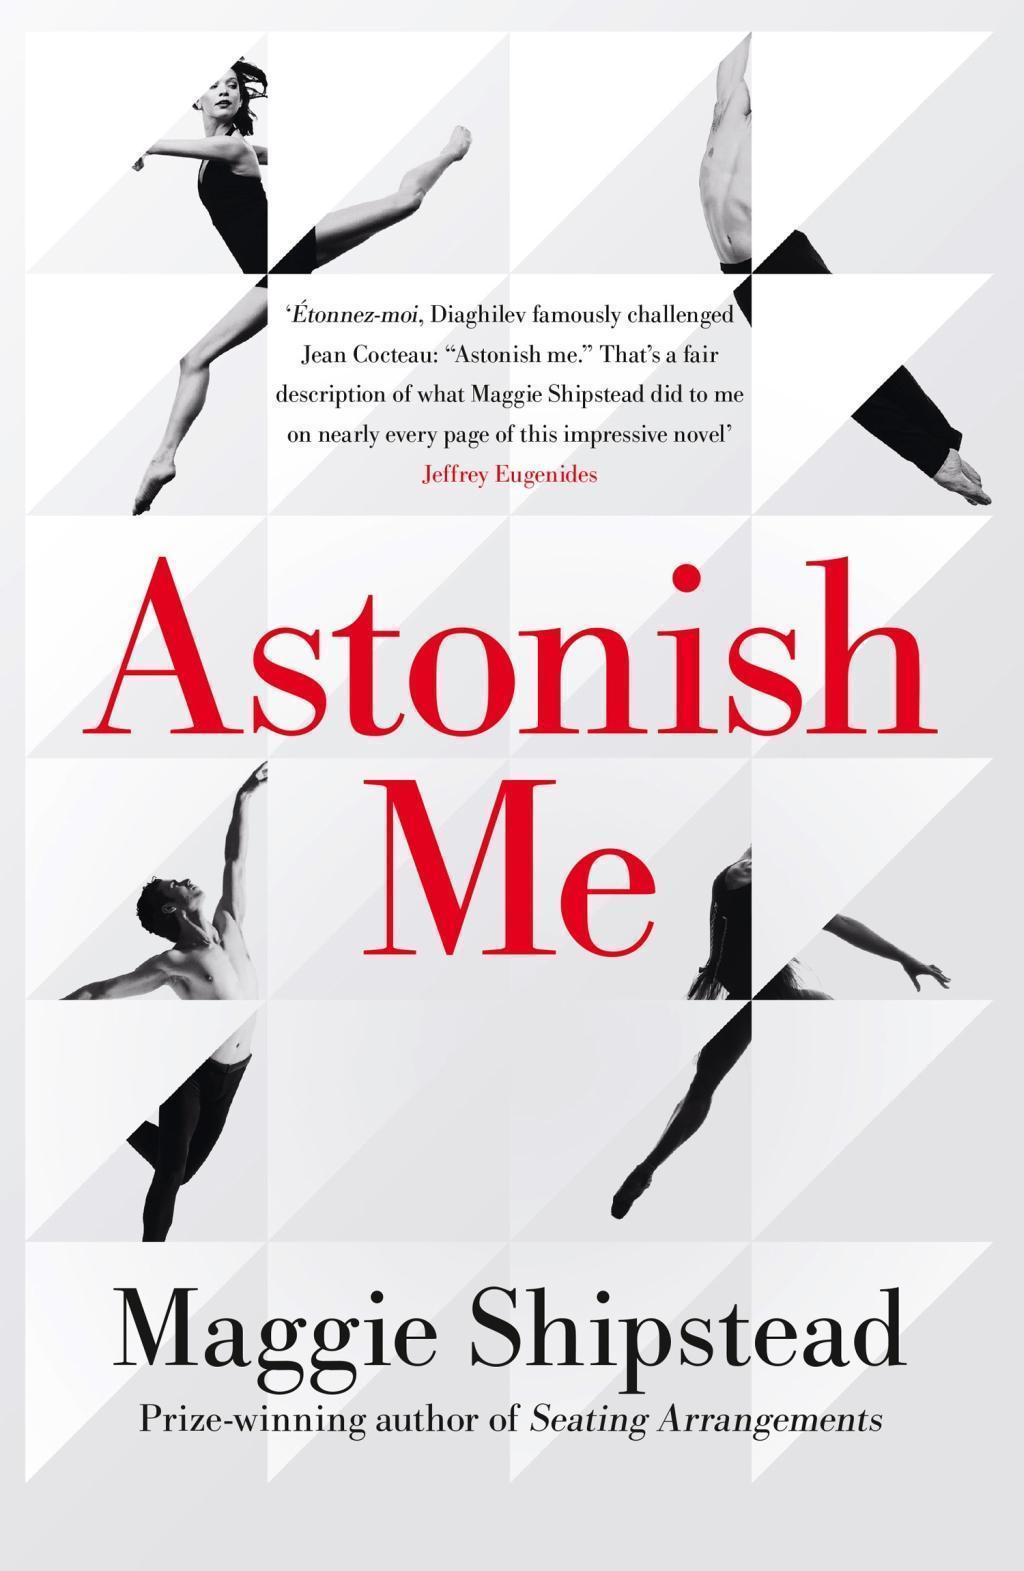 Astonish Me